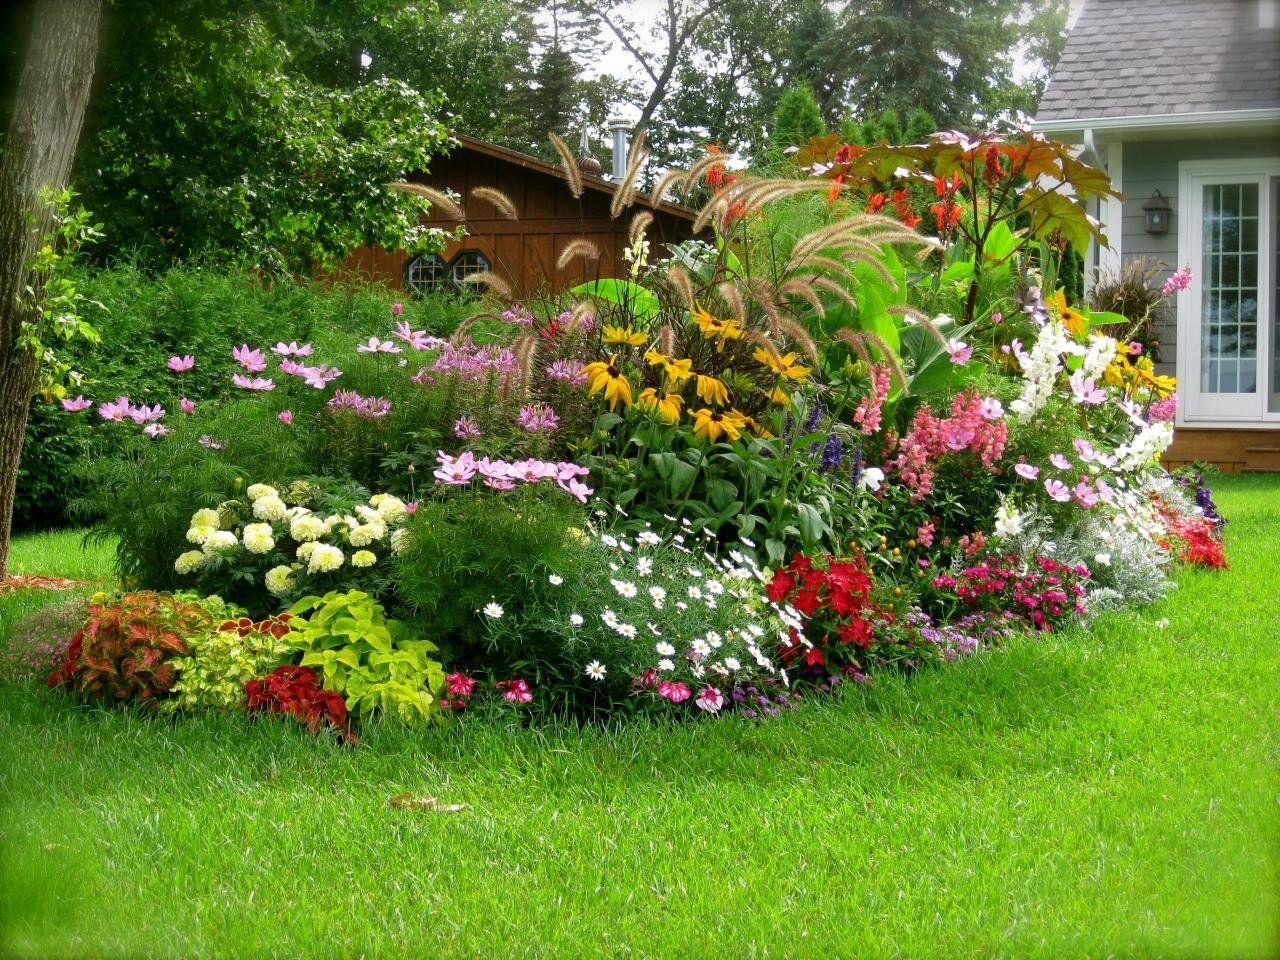 Tremendous Hanggarten Gestalten Best Choice Of Gartengestaltung Am Hang - Wie Können Sie